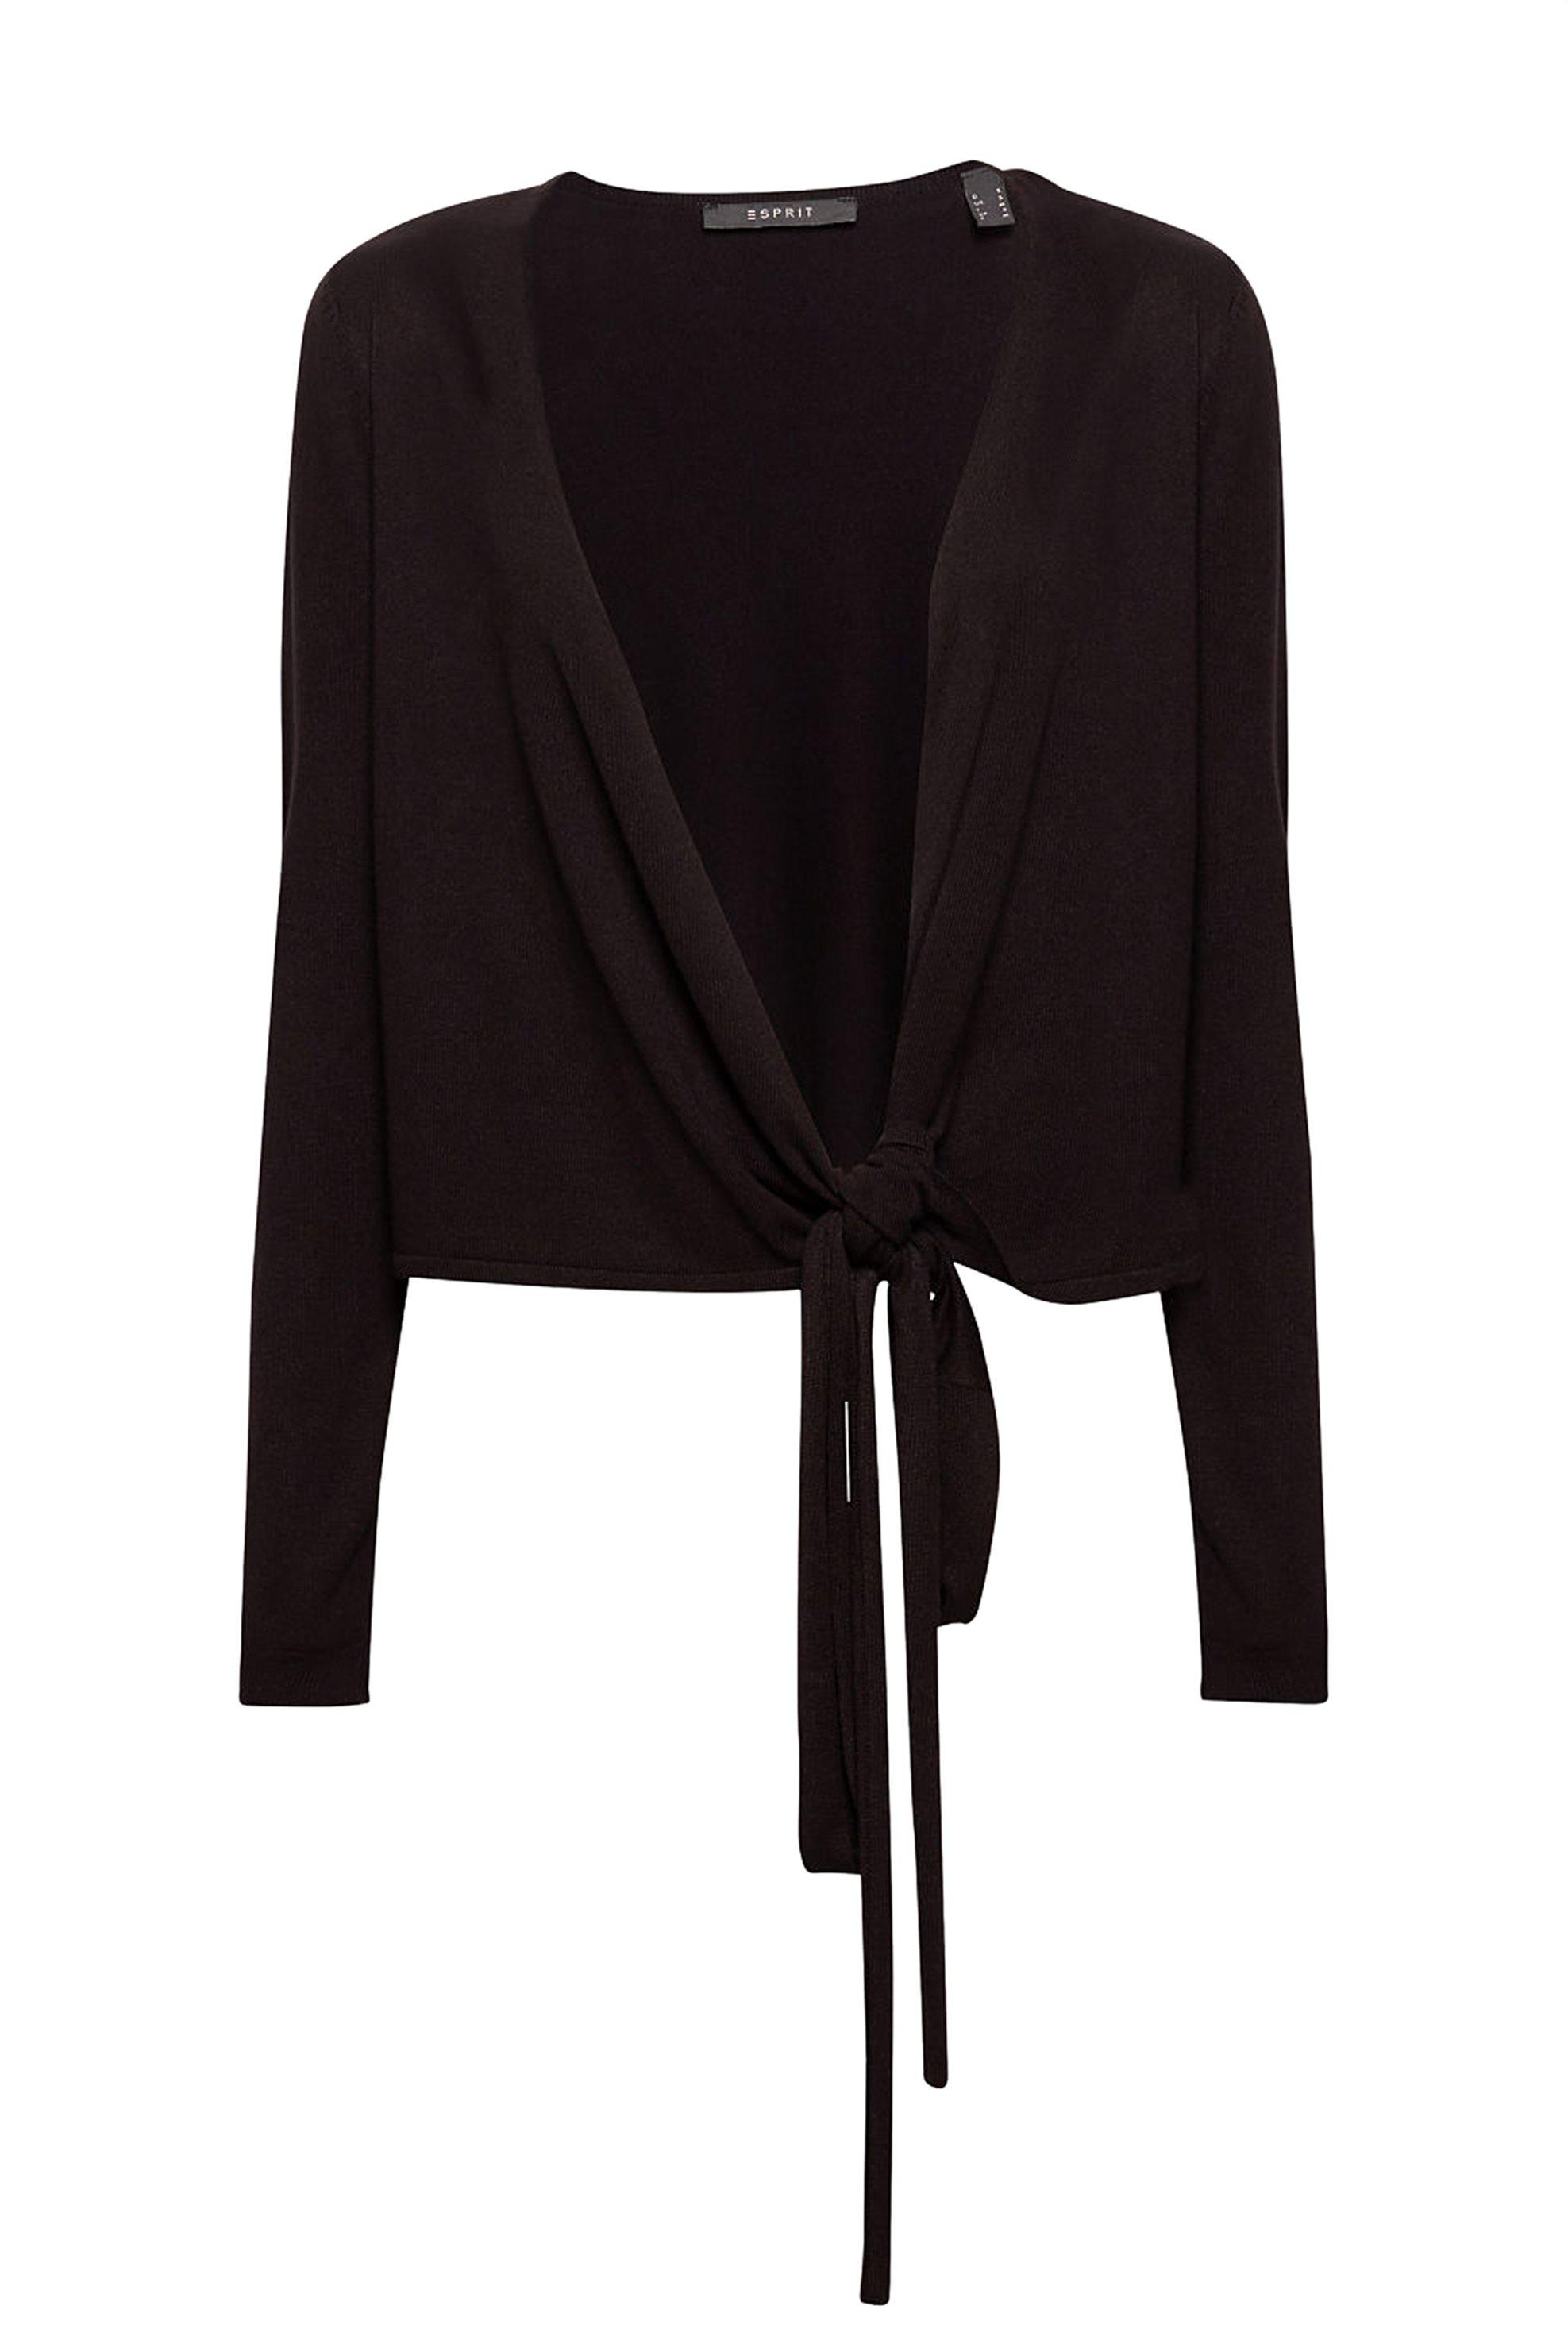 6beeddca1bff Esprit γυναικεία πλεκτή κρουαζέ μπλούζα με ζώνη - 128EO1I012 - Μαύρο